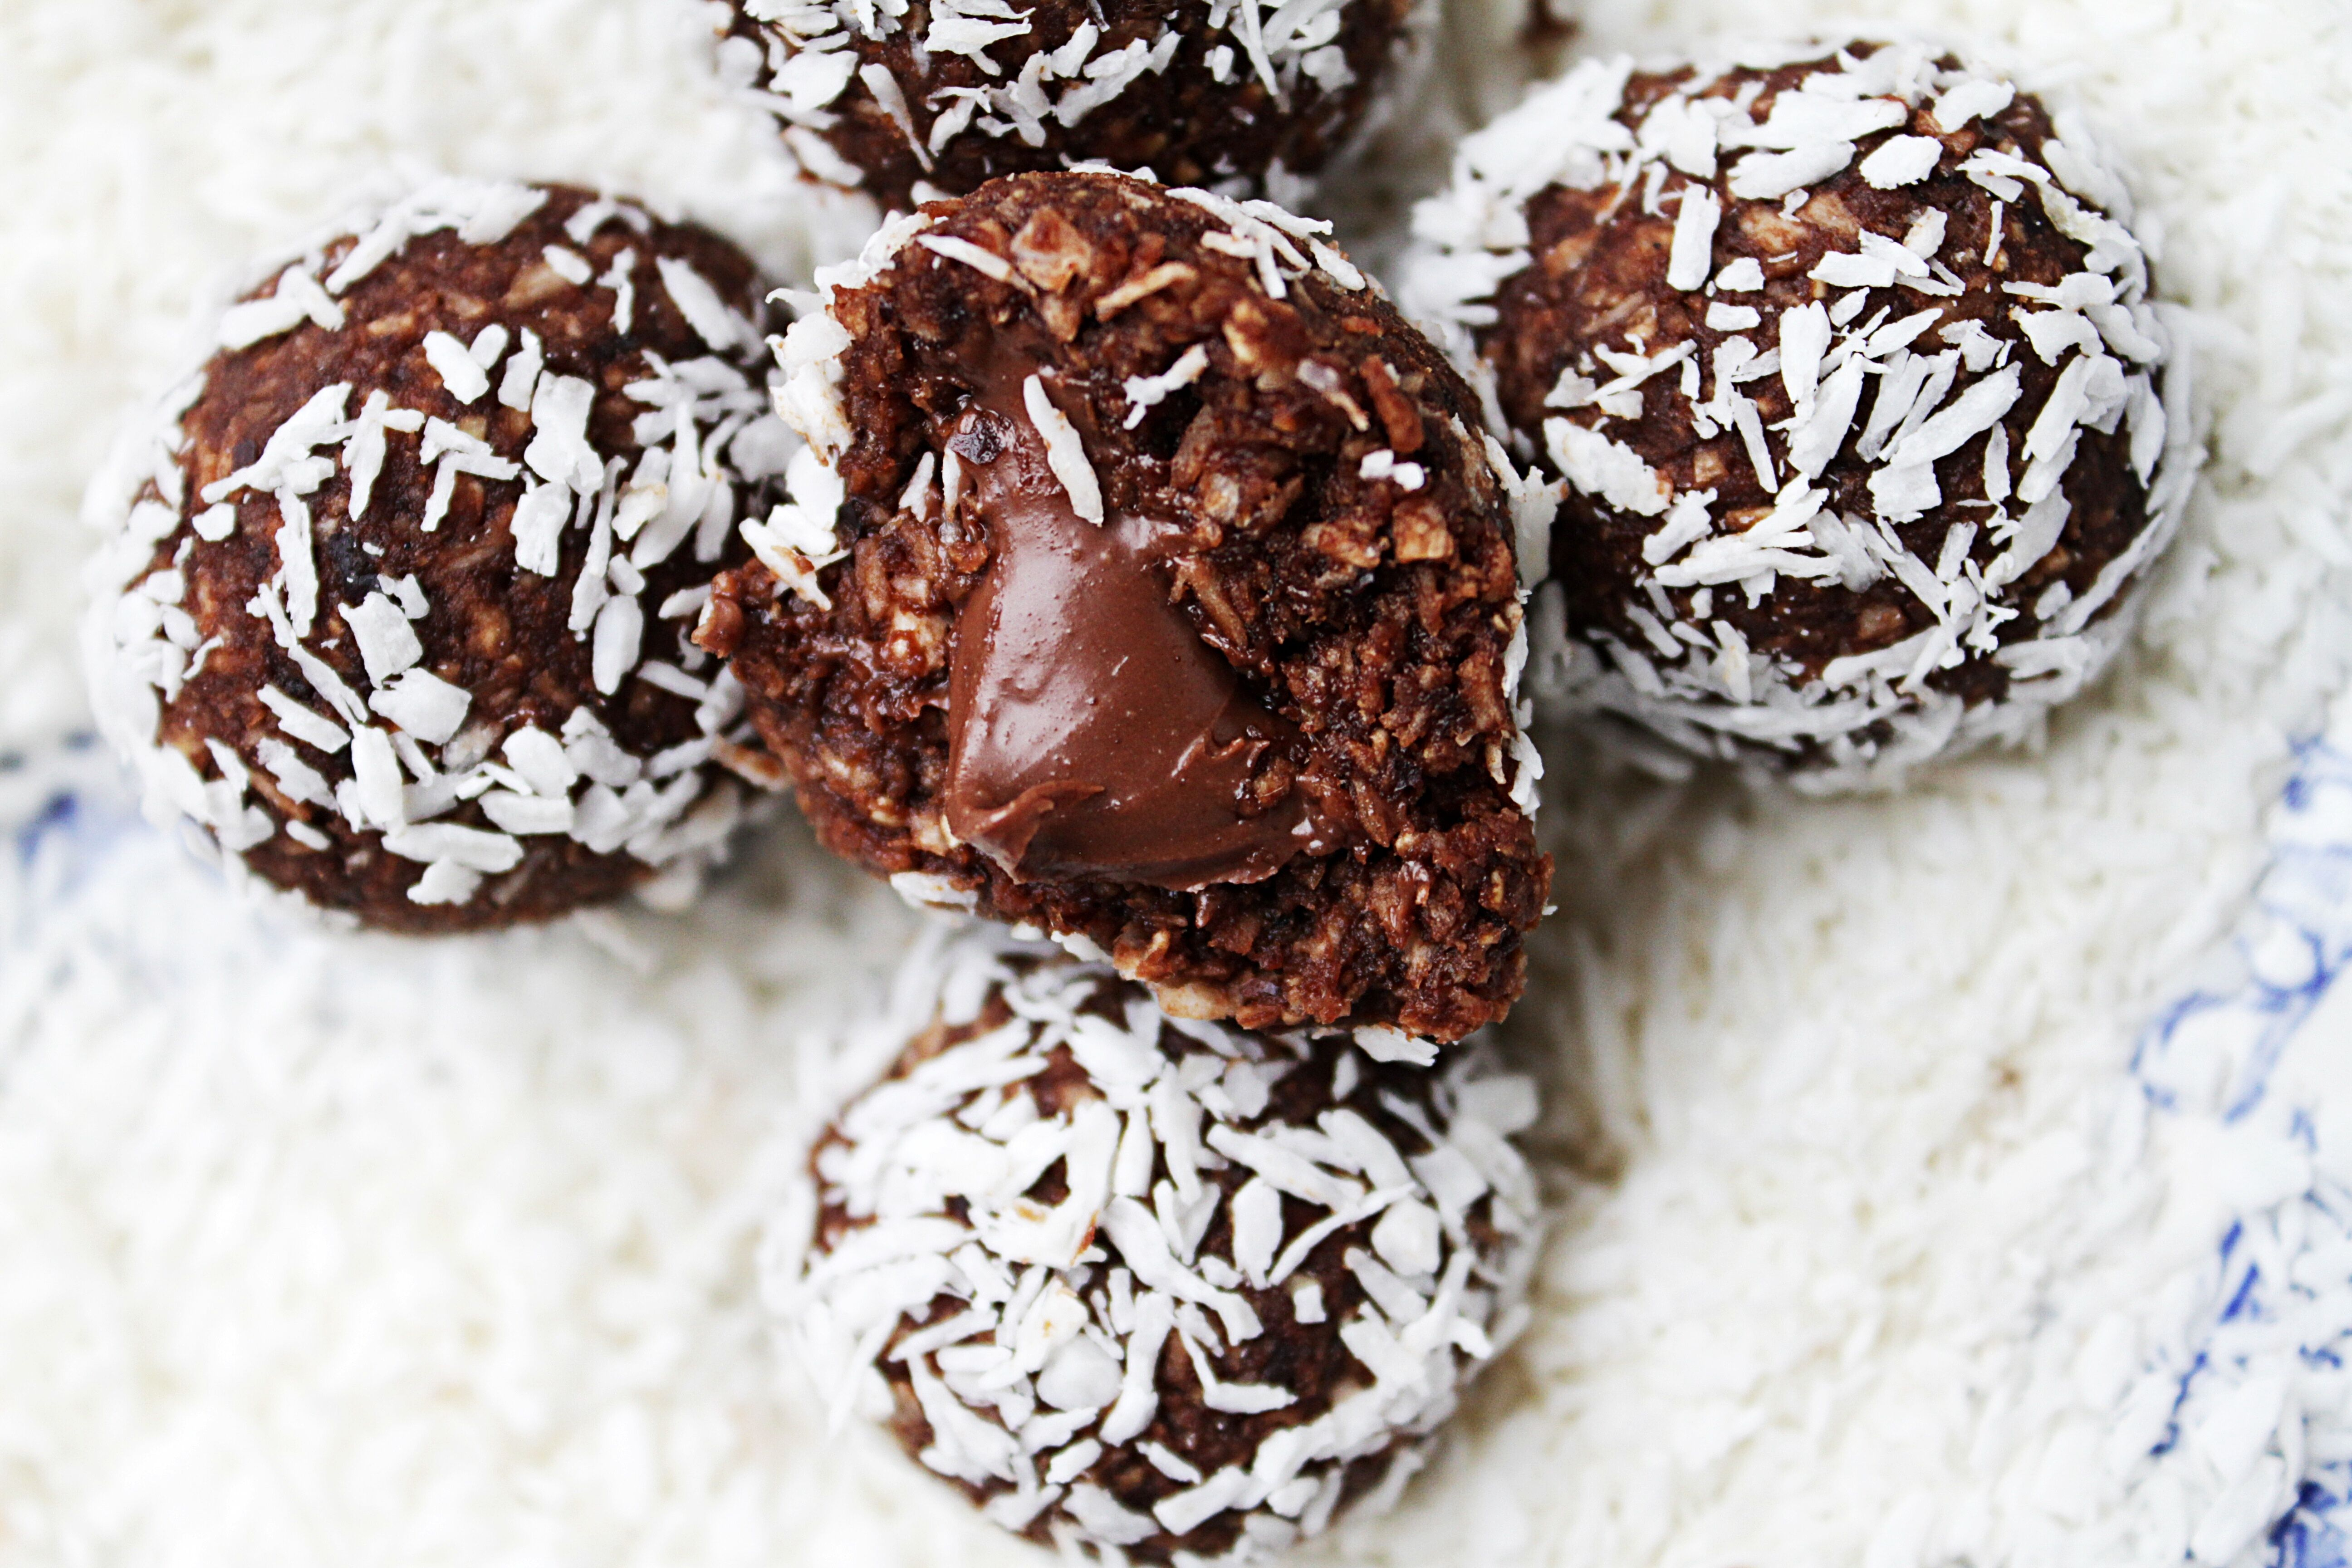 veganska chokladbollar recept